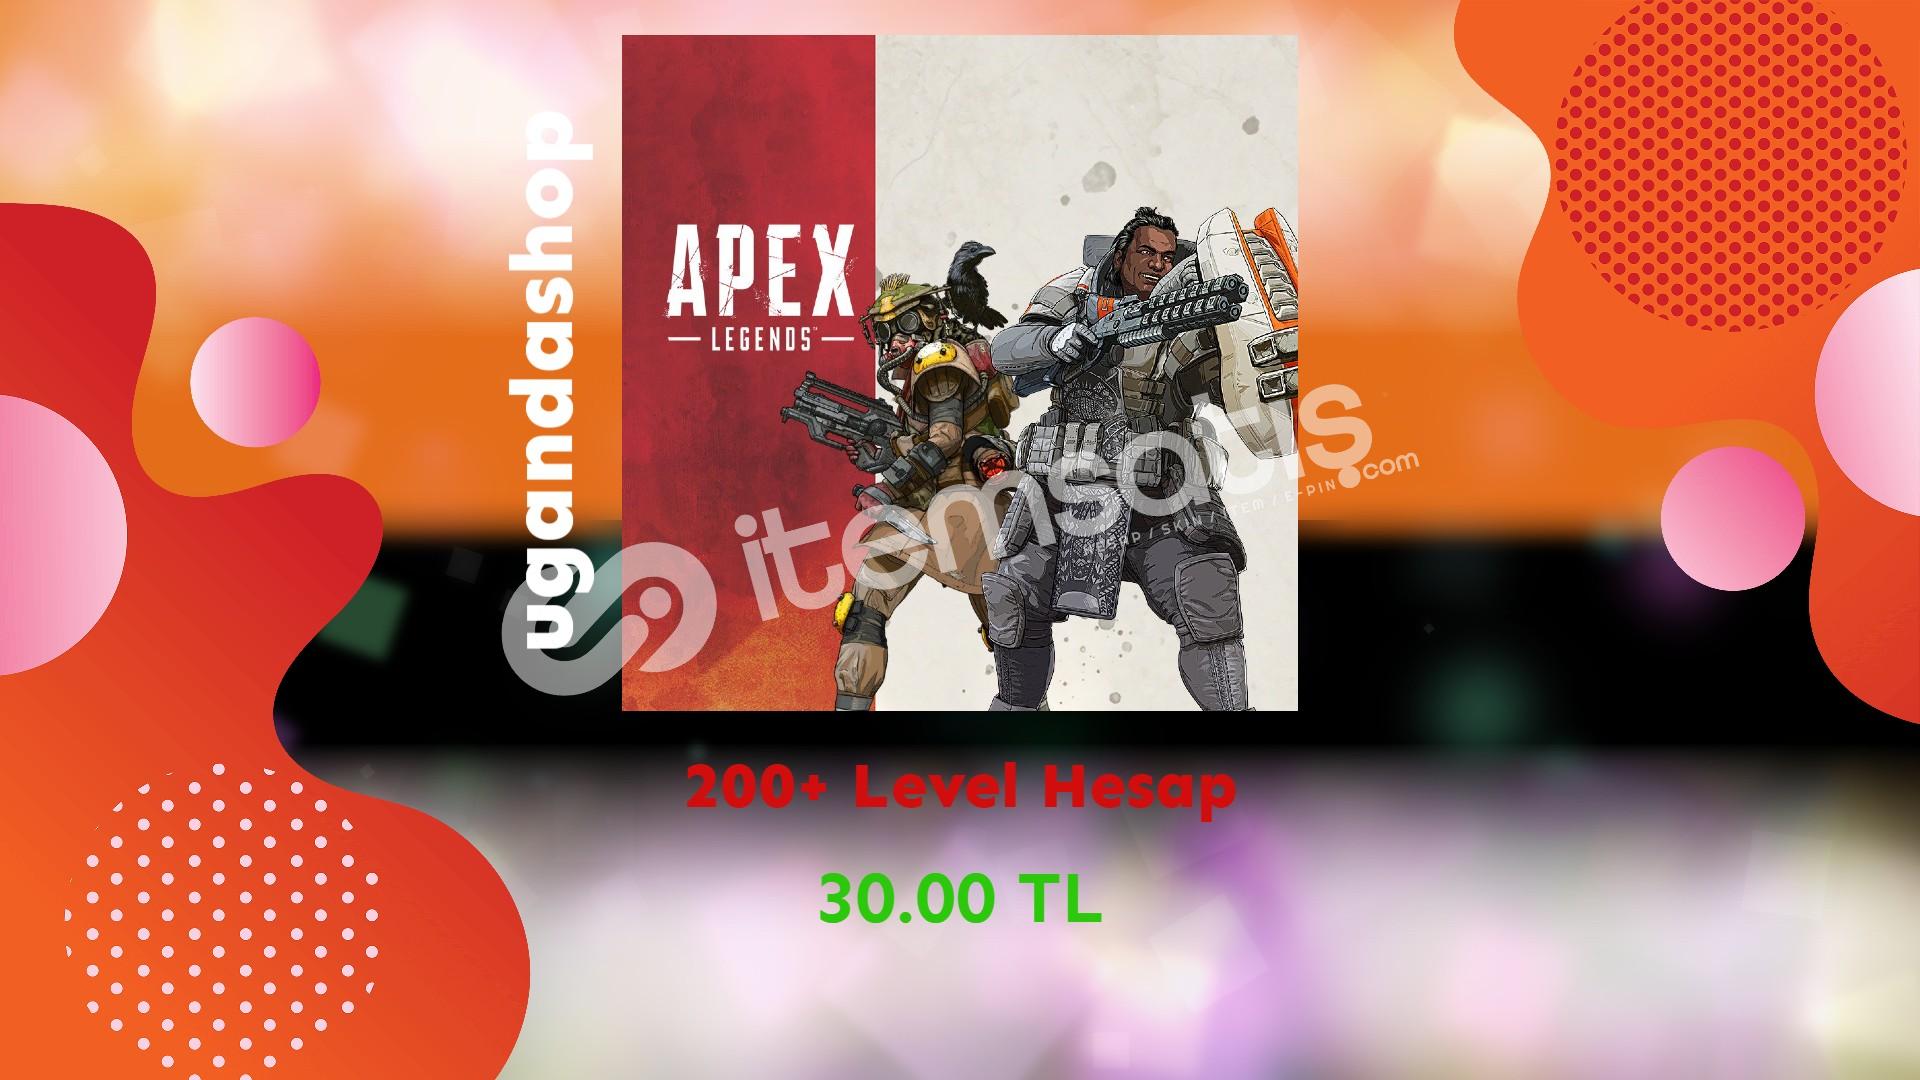 Apex Legends 200+ Level Origin Hesap + Garanti